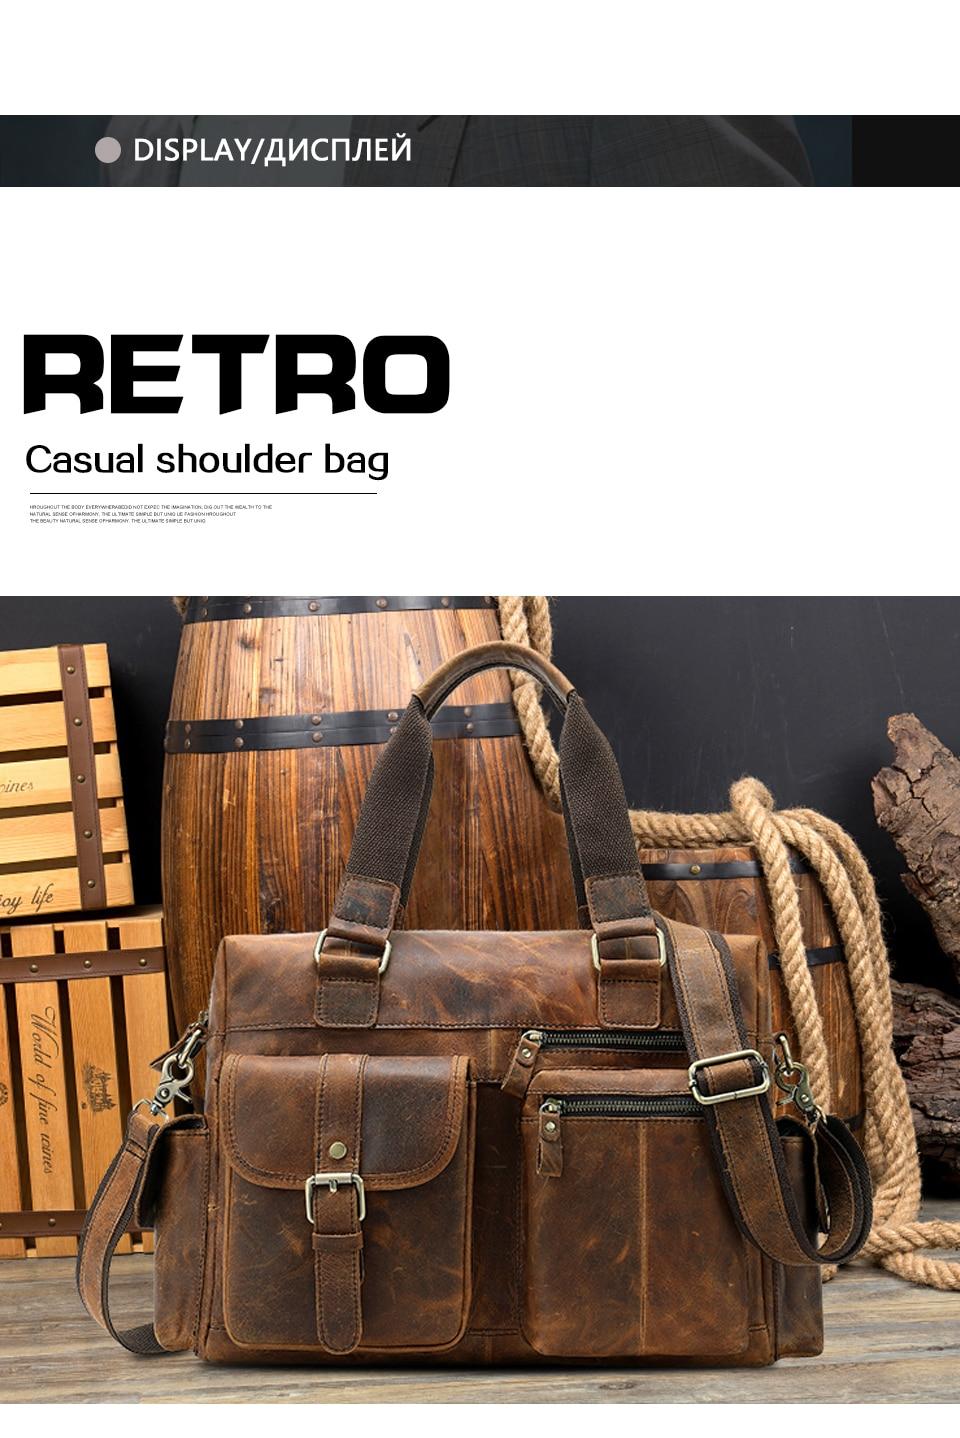 HTB1NRnQX5HrK1Rjy0Flq6AsaFXaD MVA Genuine Leather Men's Briefcase Messenger Bag Men's Leather Laptop Bag For men Office Bags For Men Briefcase Handbags 8537